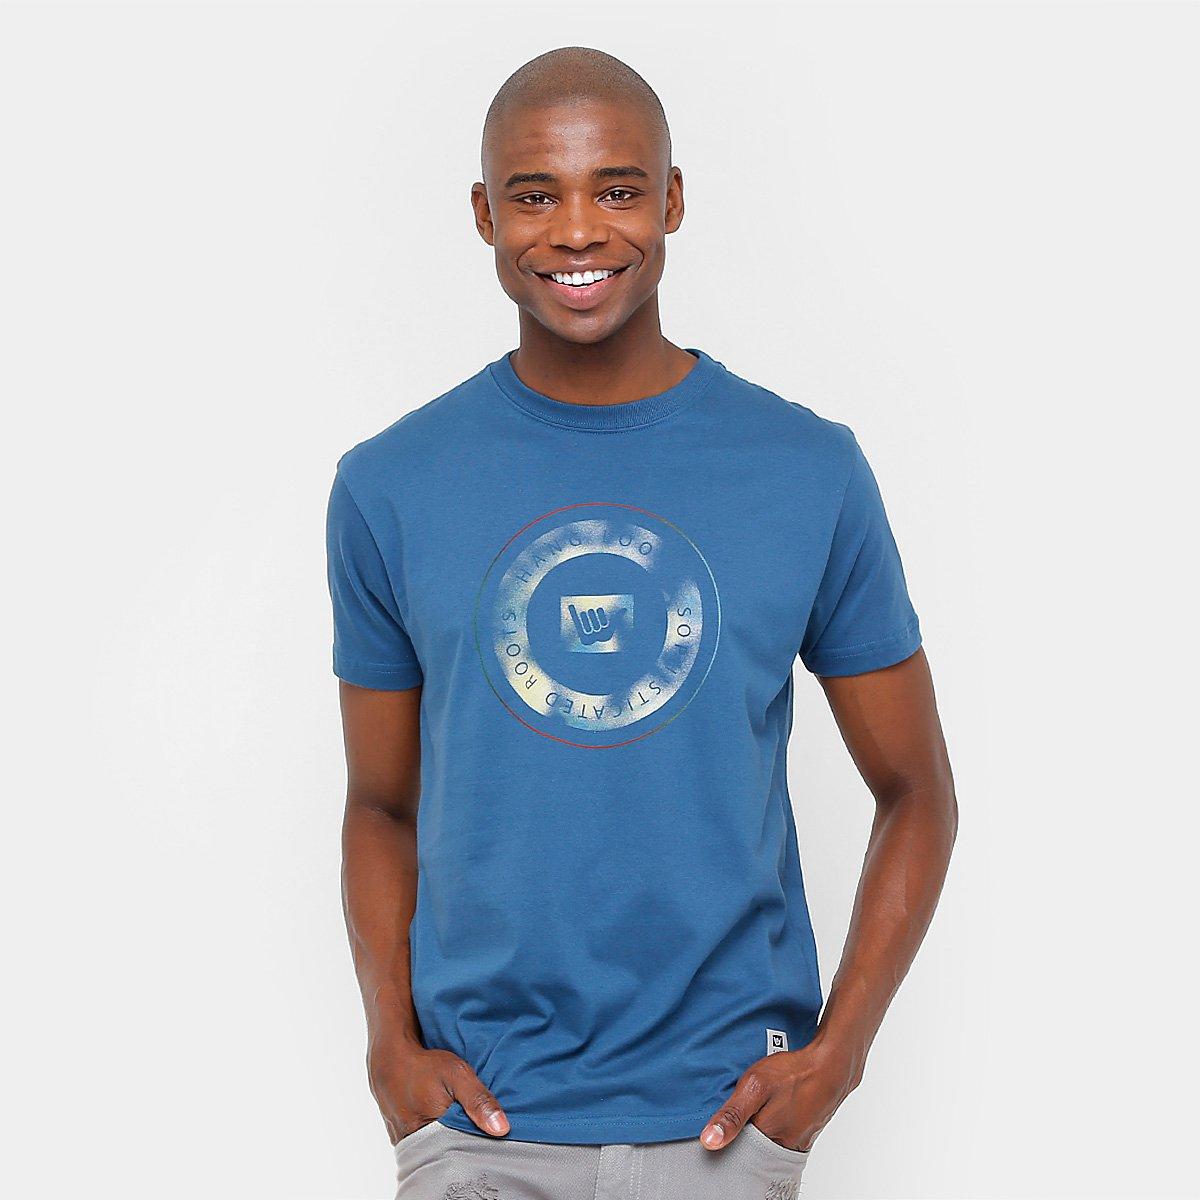 b4a3cc718c Camiseta Hang Loose Silk Circle Masculina - Compre Agora